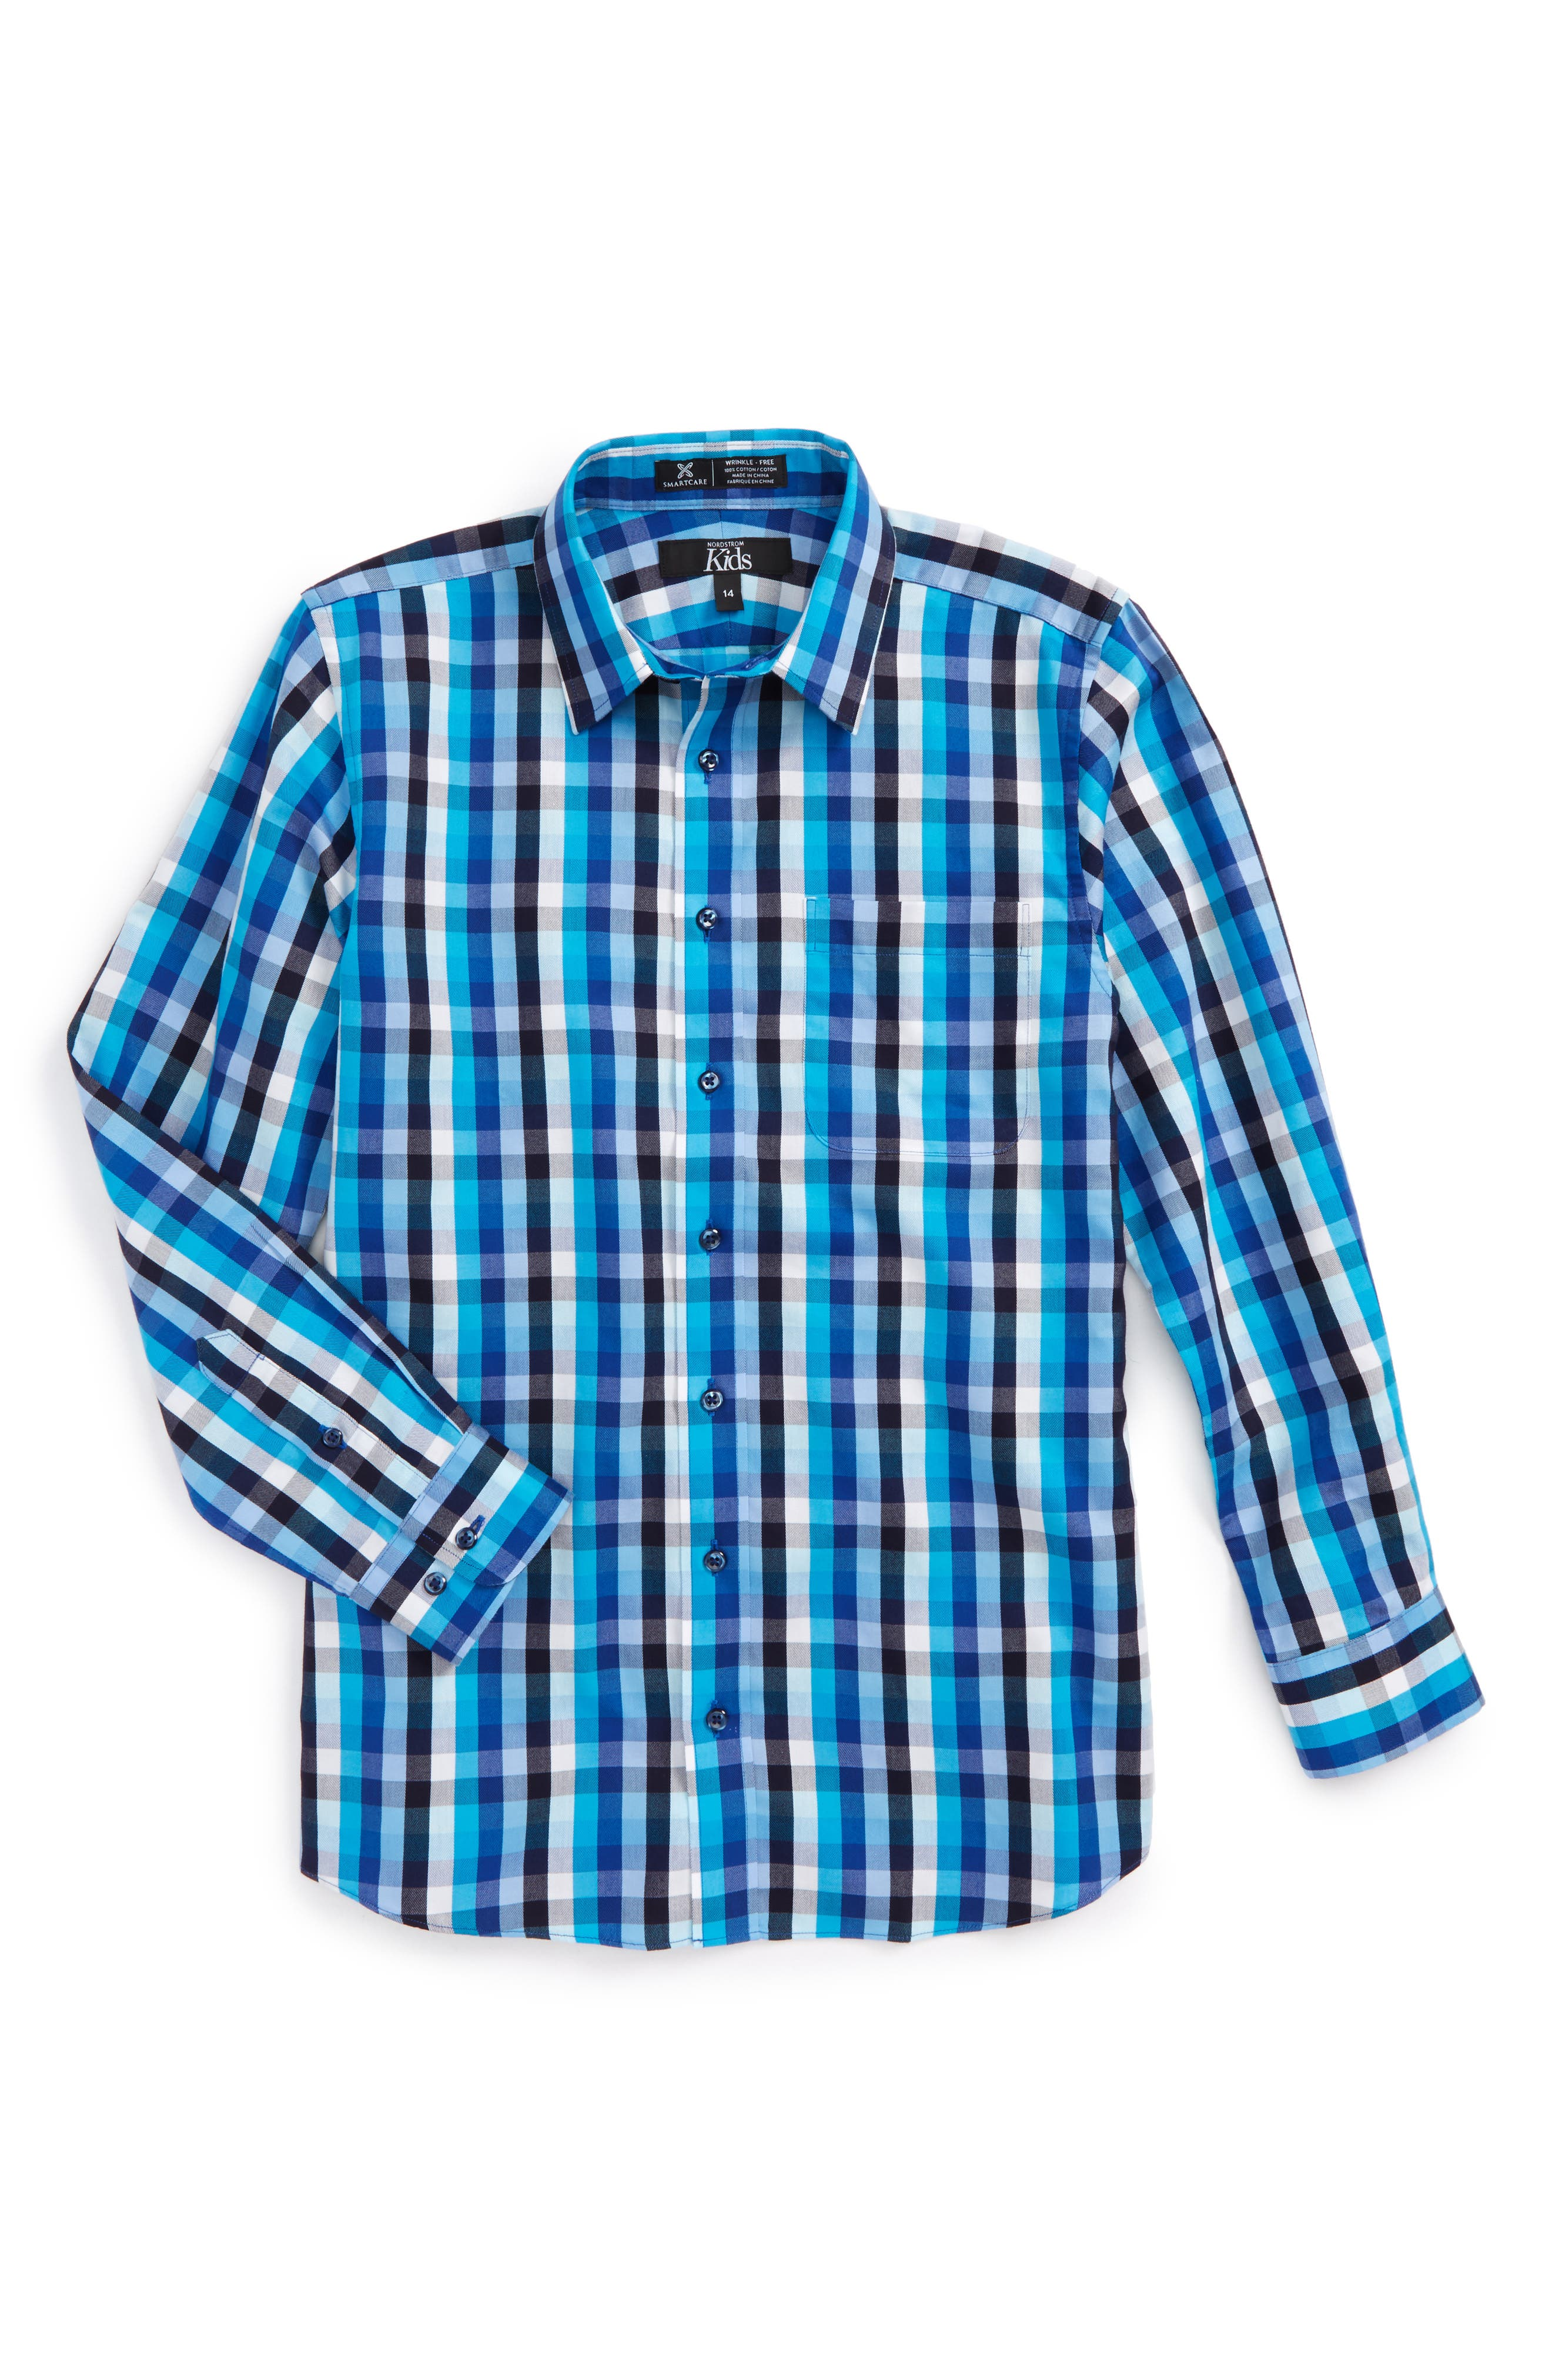 Alternate Image 1 Selected - Nordstrom Smartcare™ Danube Plaid Dress Shirt (Big Boys)